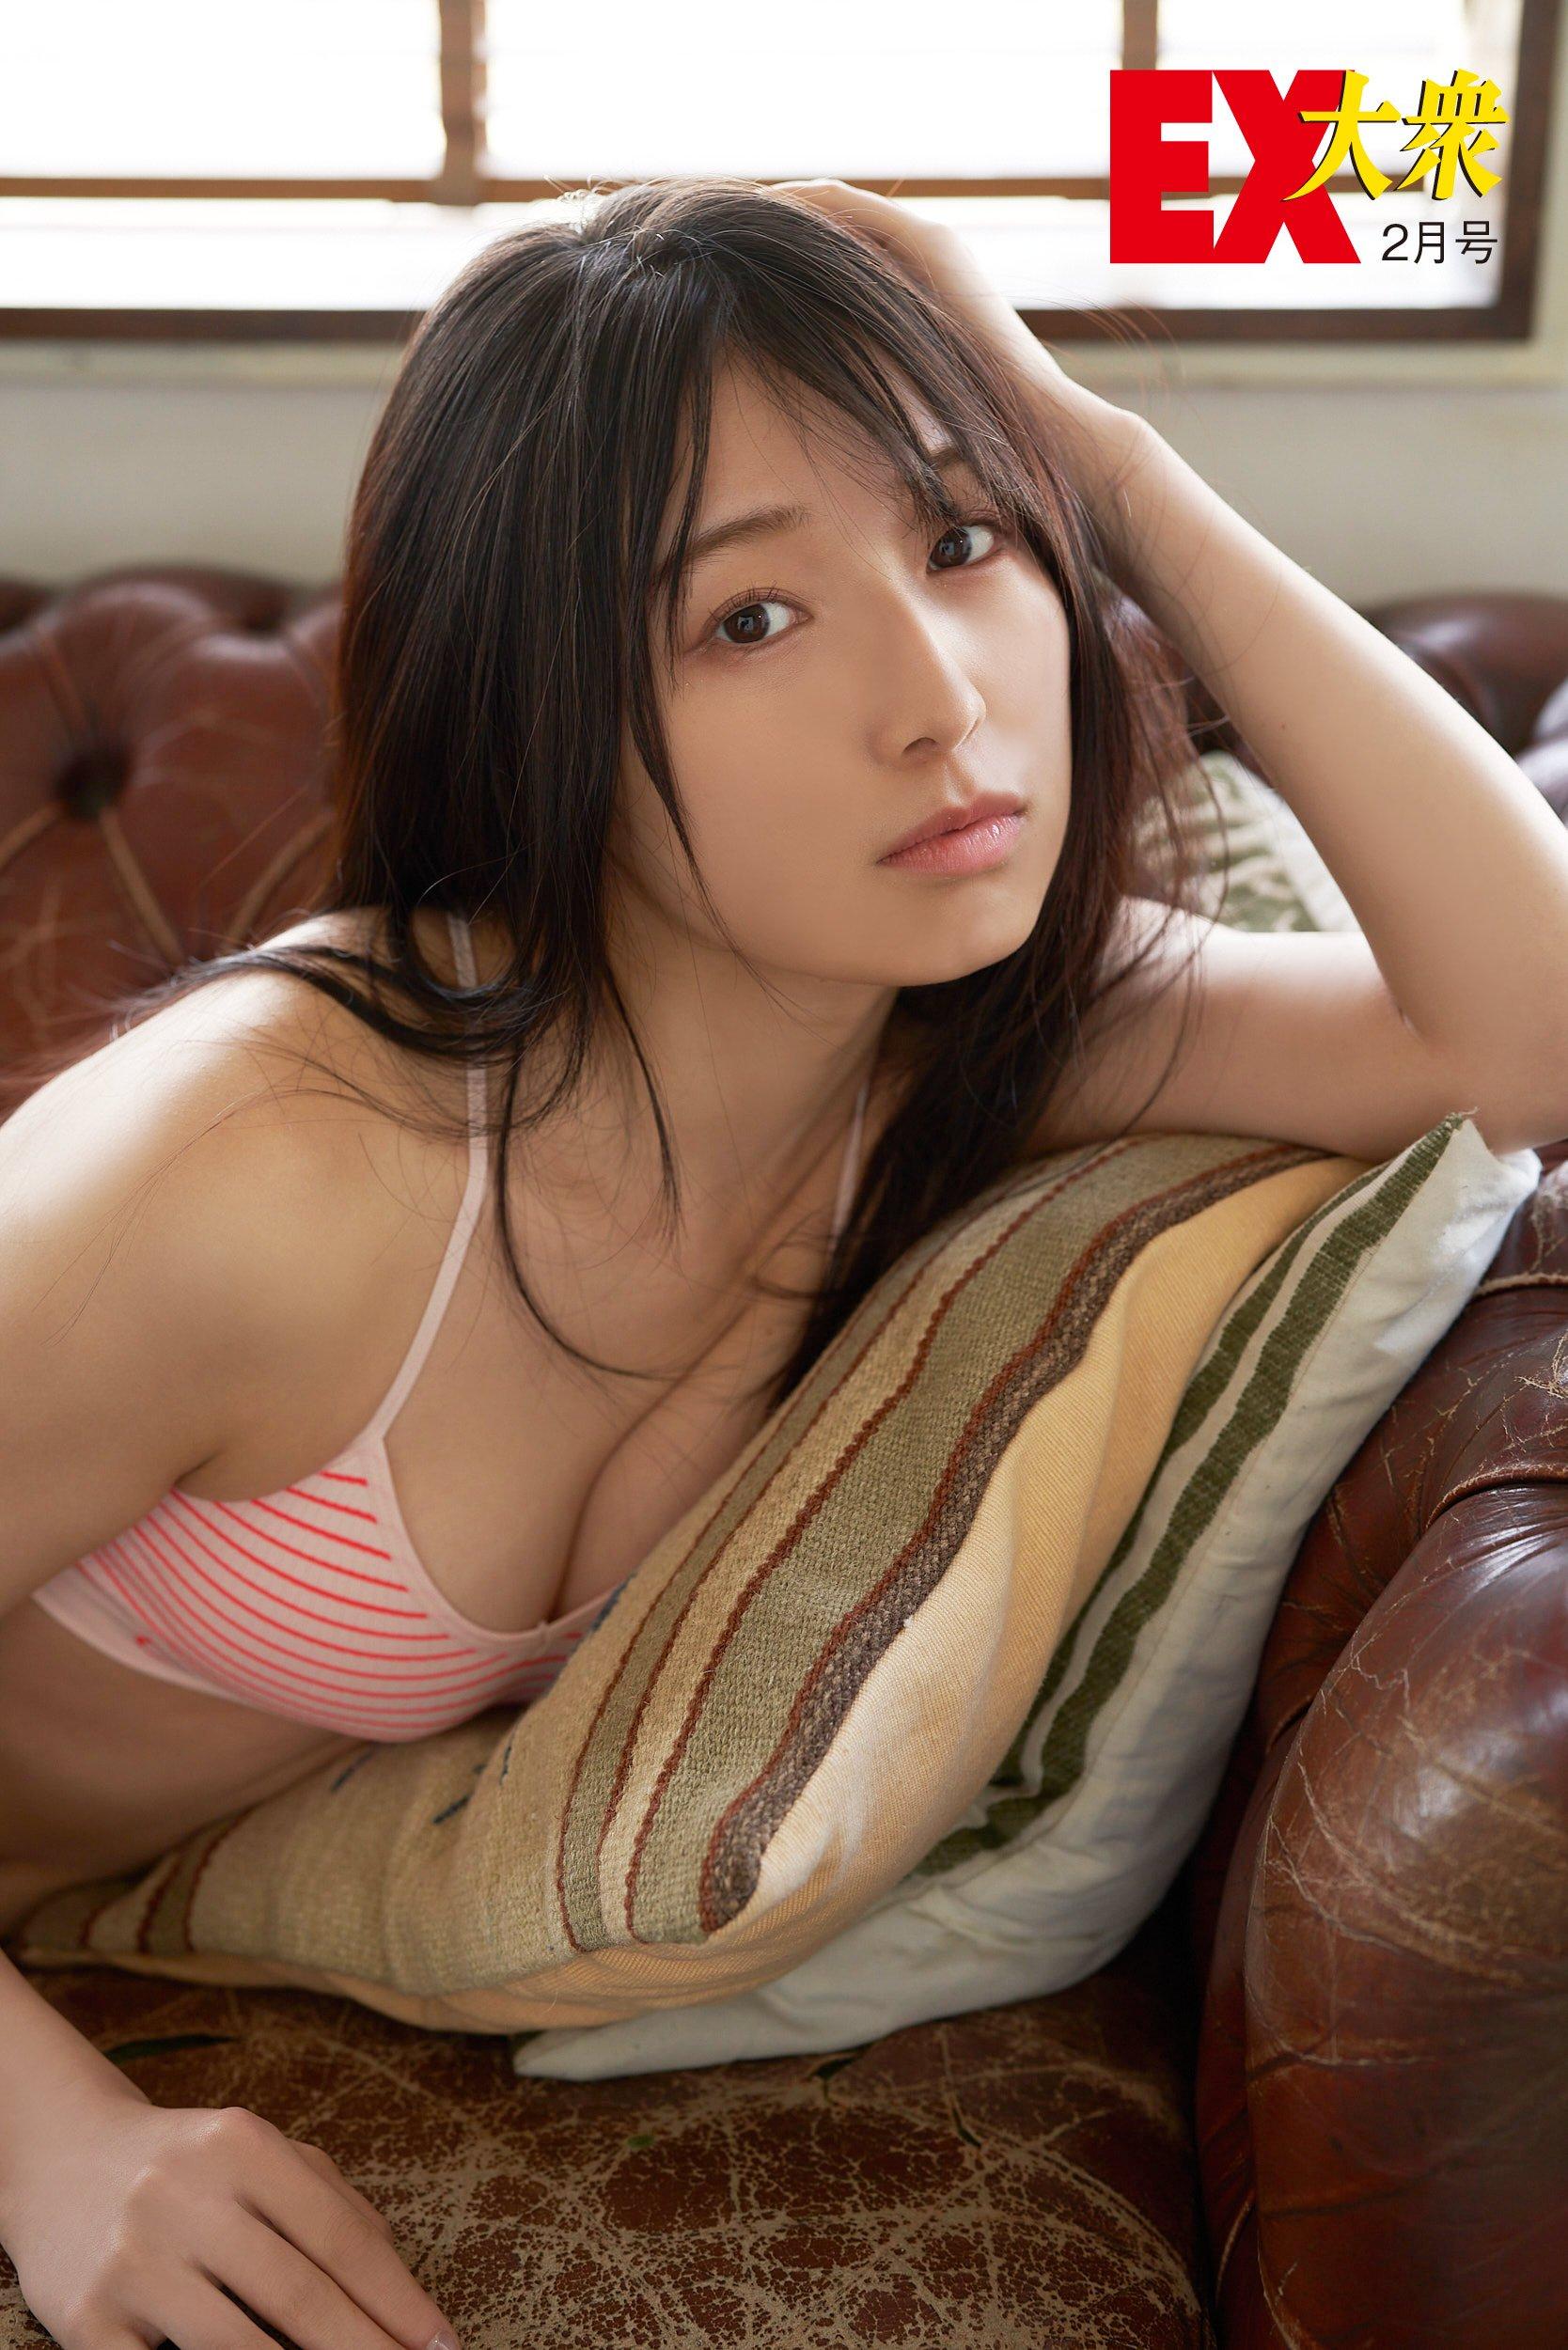 NMB48安部若菜の本誌未掲載カット4枚を大公開!【EX大衆2月号】の画像002